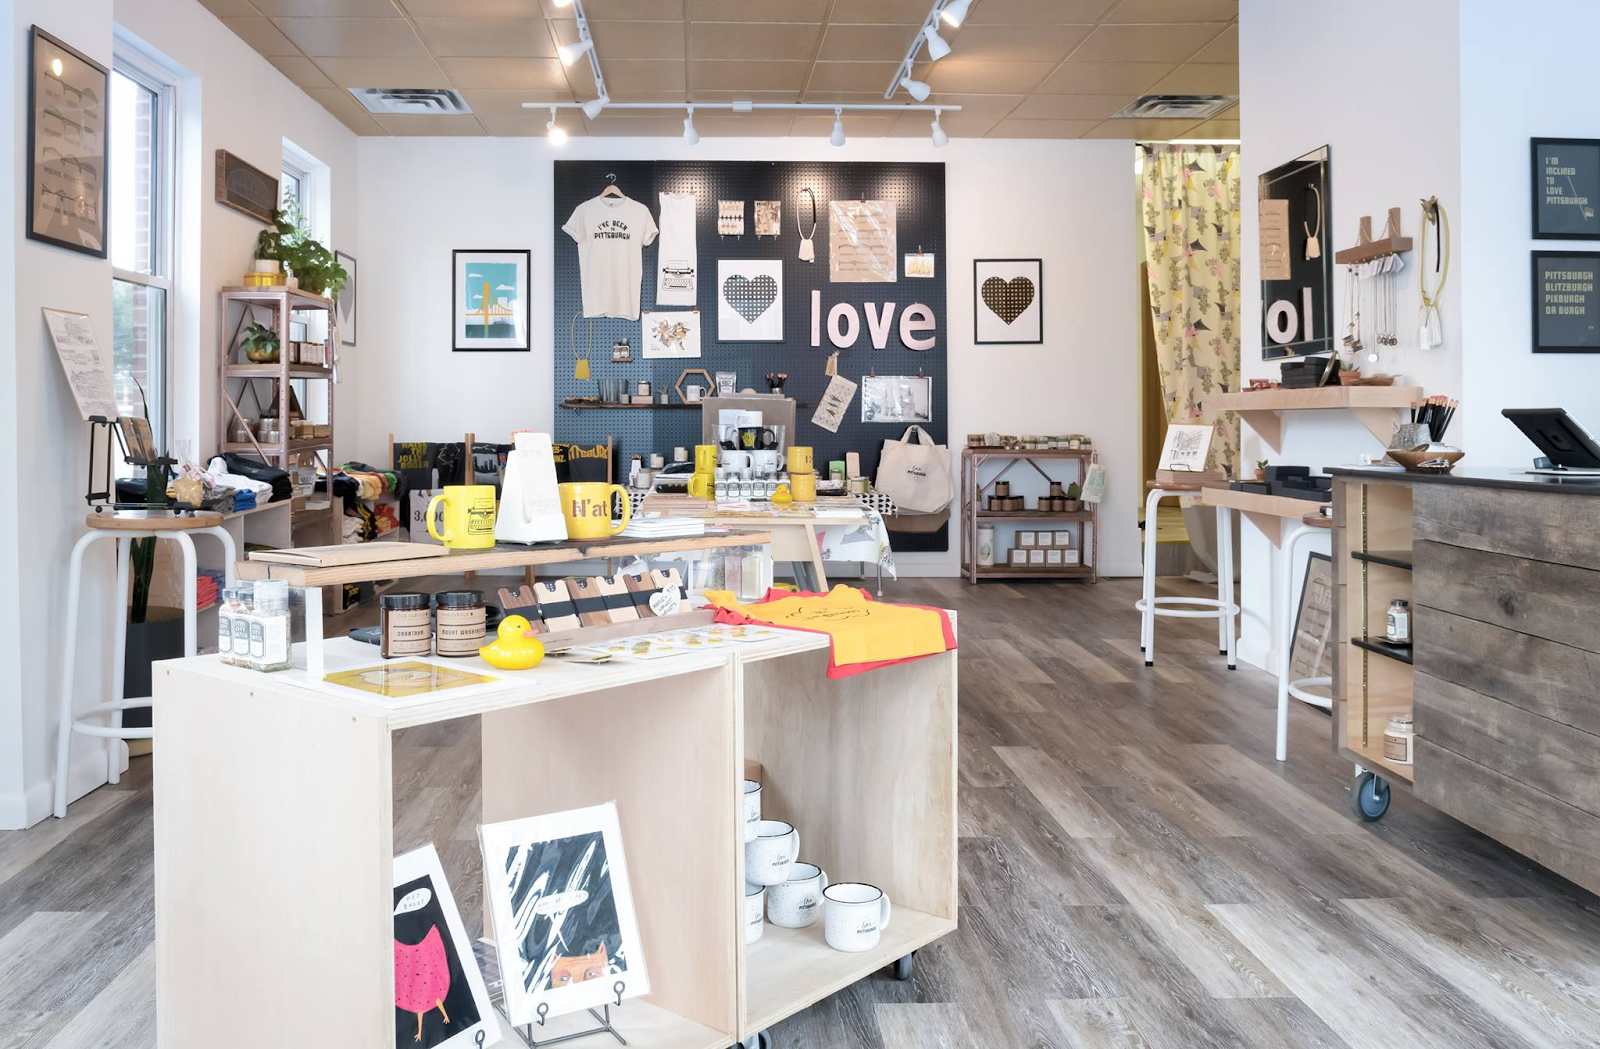 Love, Pittsburgh gift shop